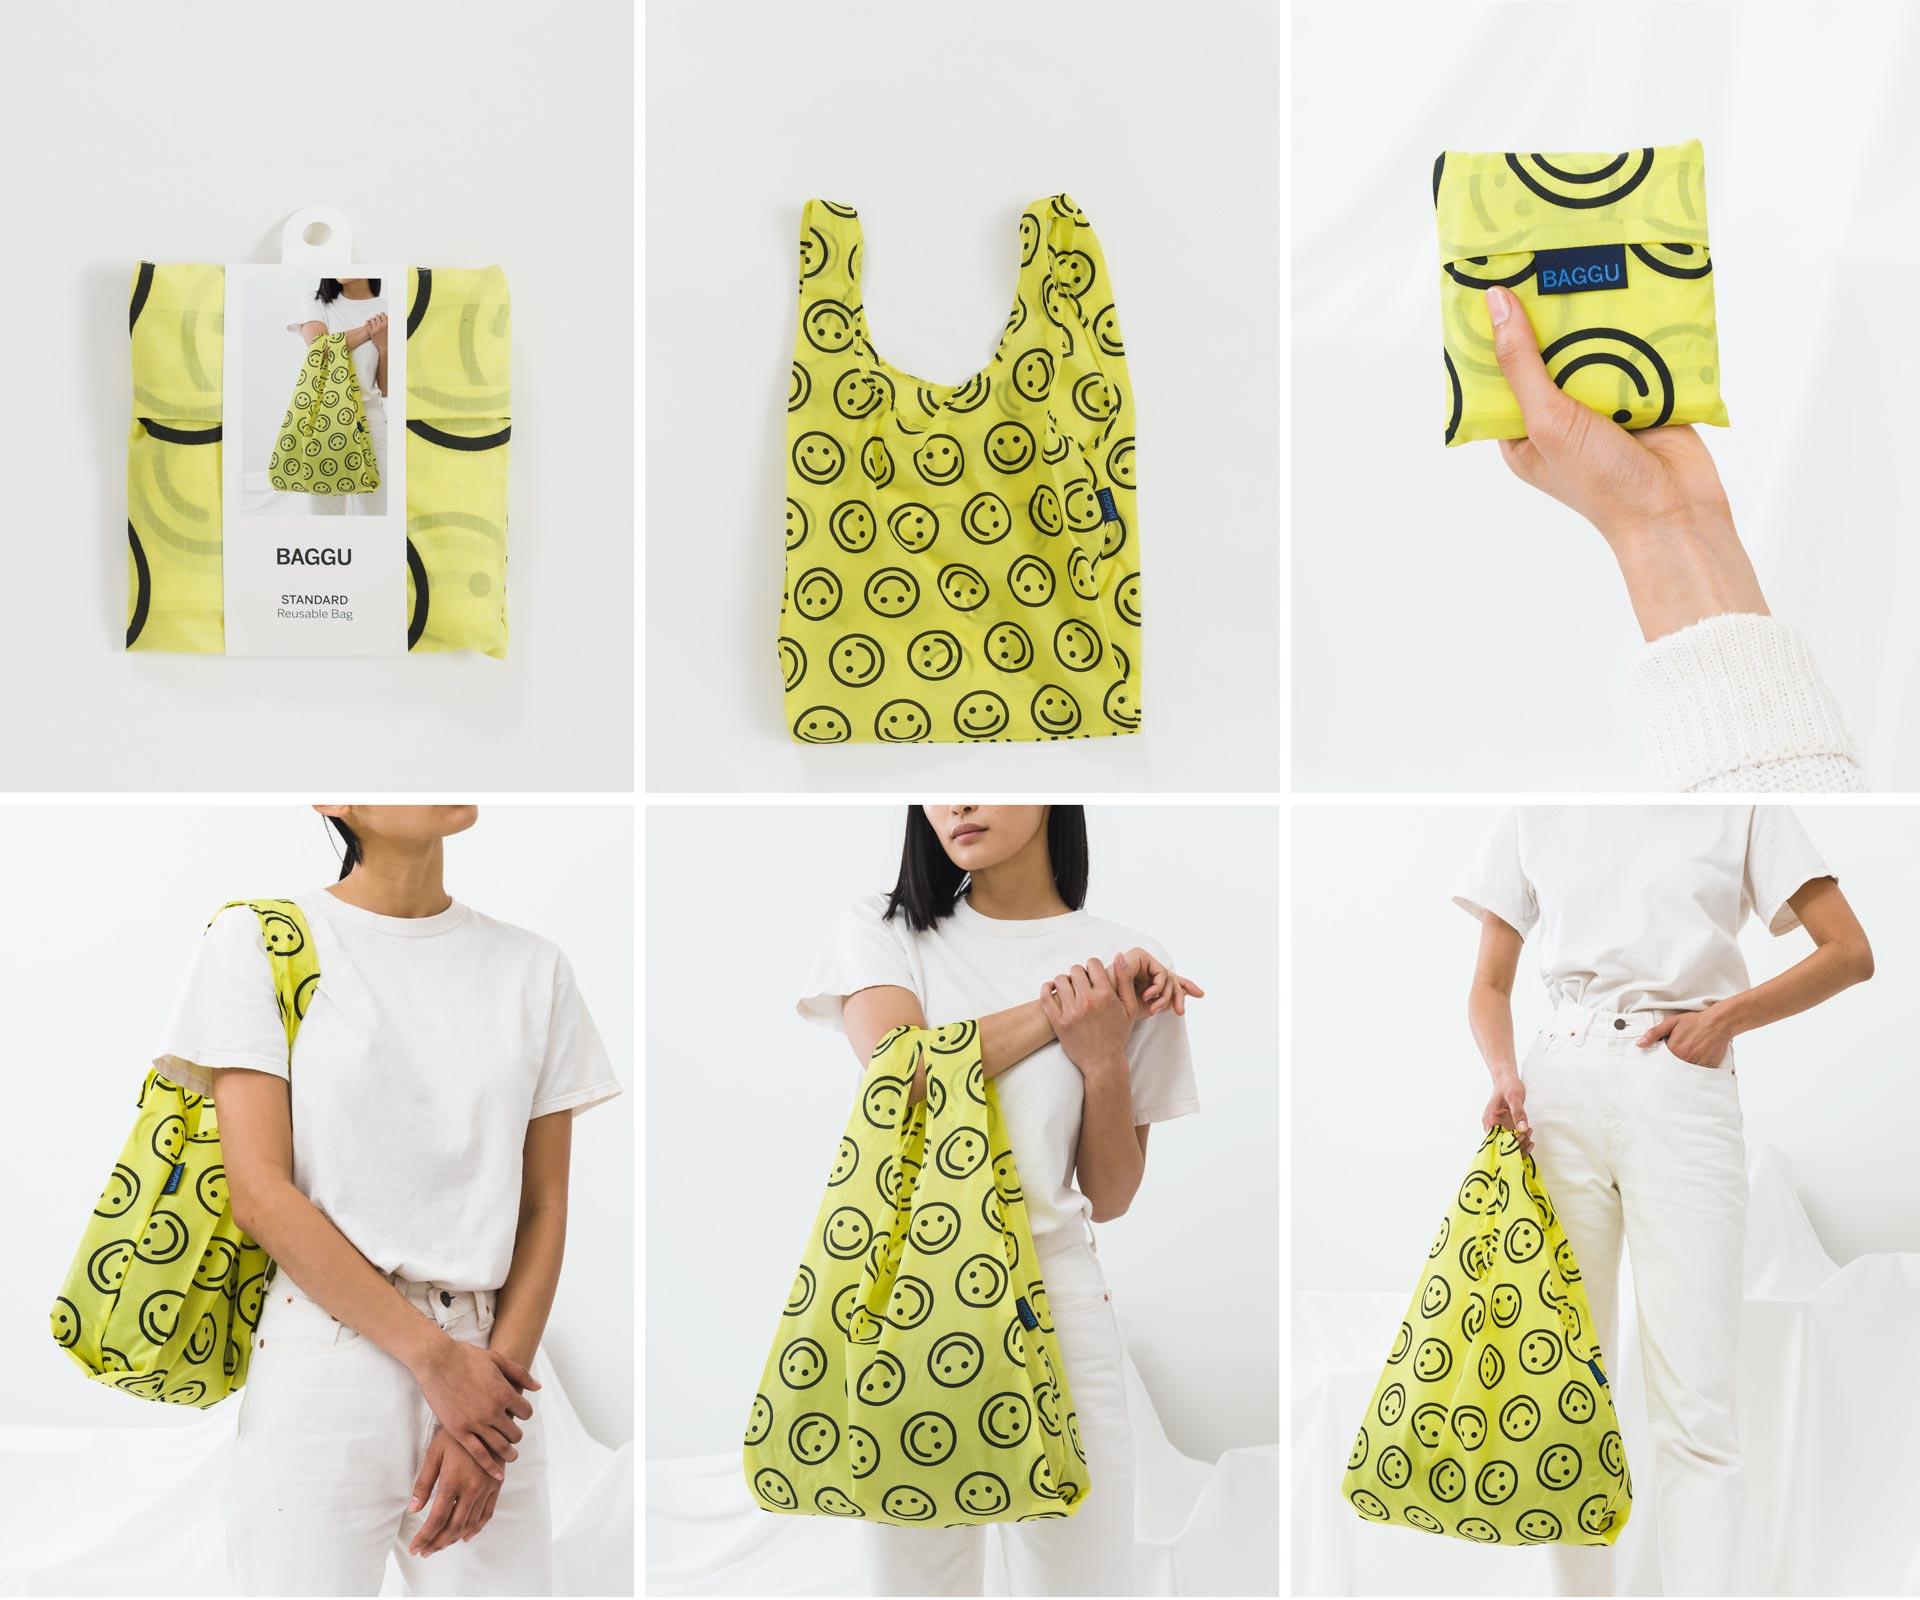 standard-baggu-ripstop-yellow-happy-1.jpg